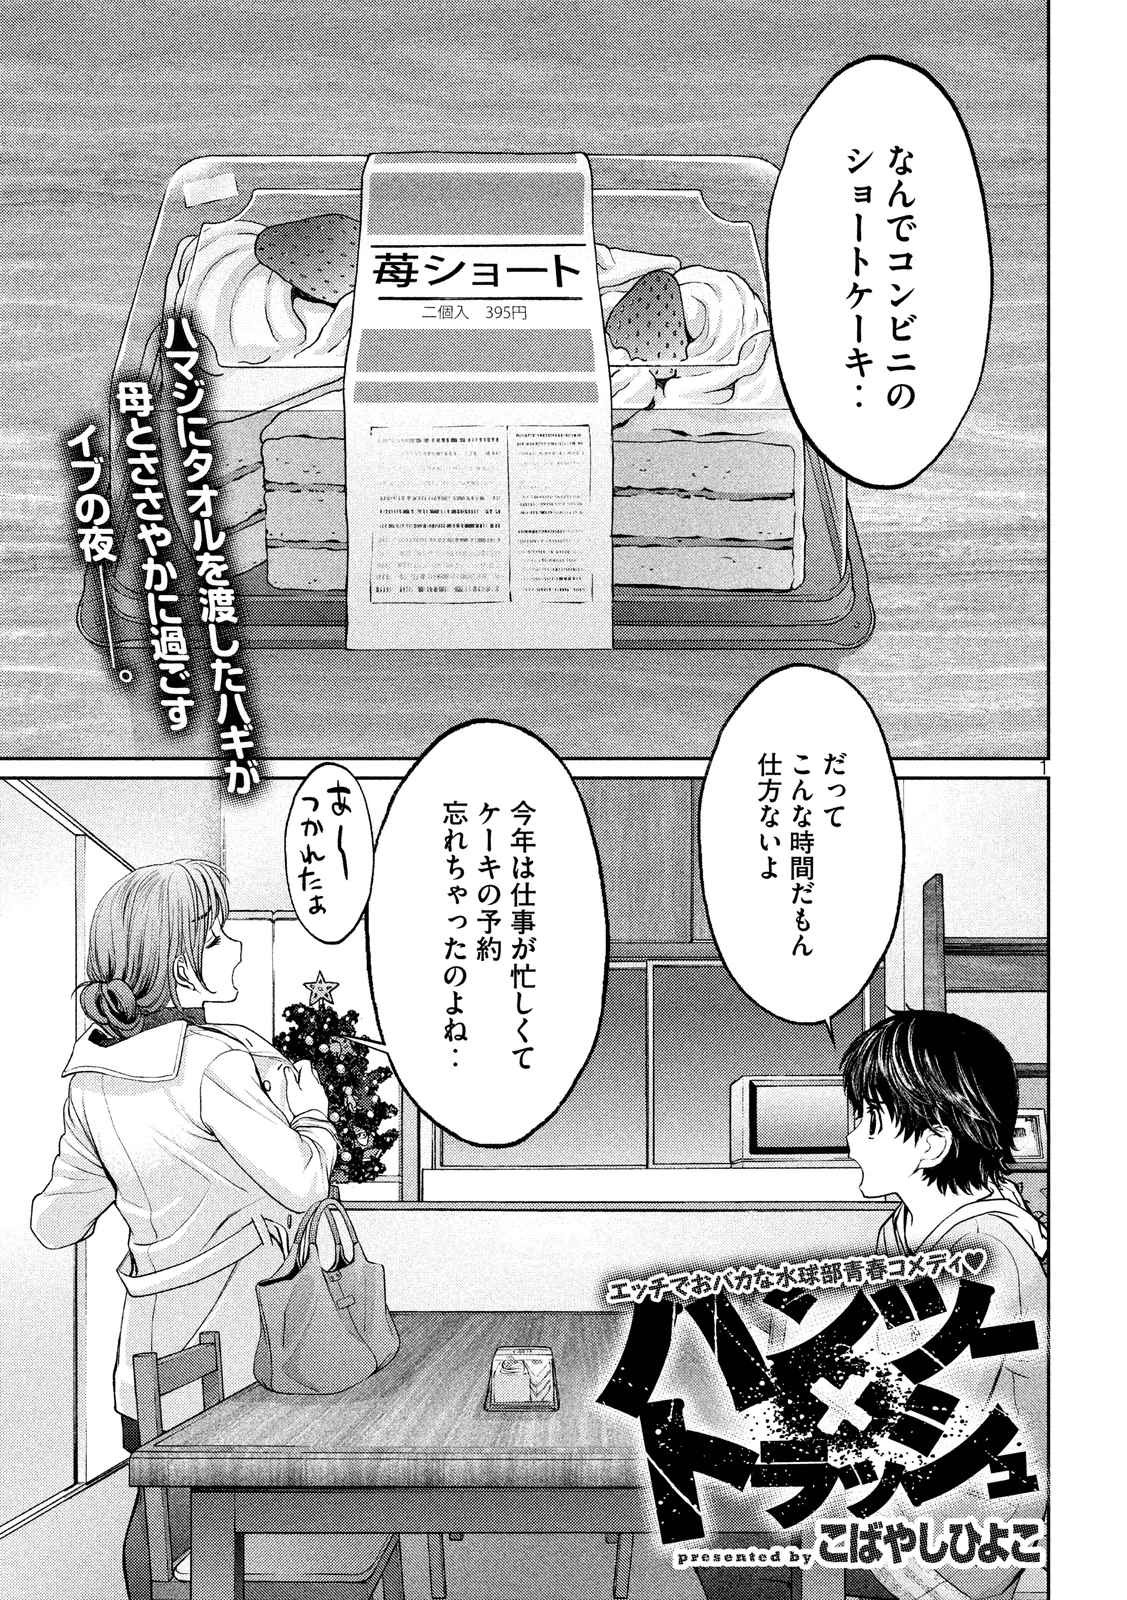 Hantsu_x_Trash Chapter 132 Page 1